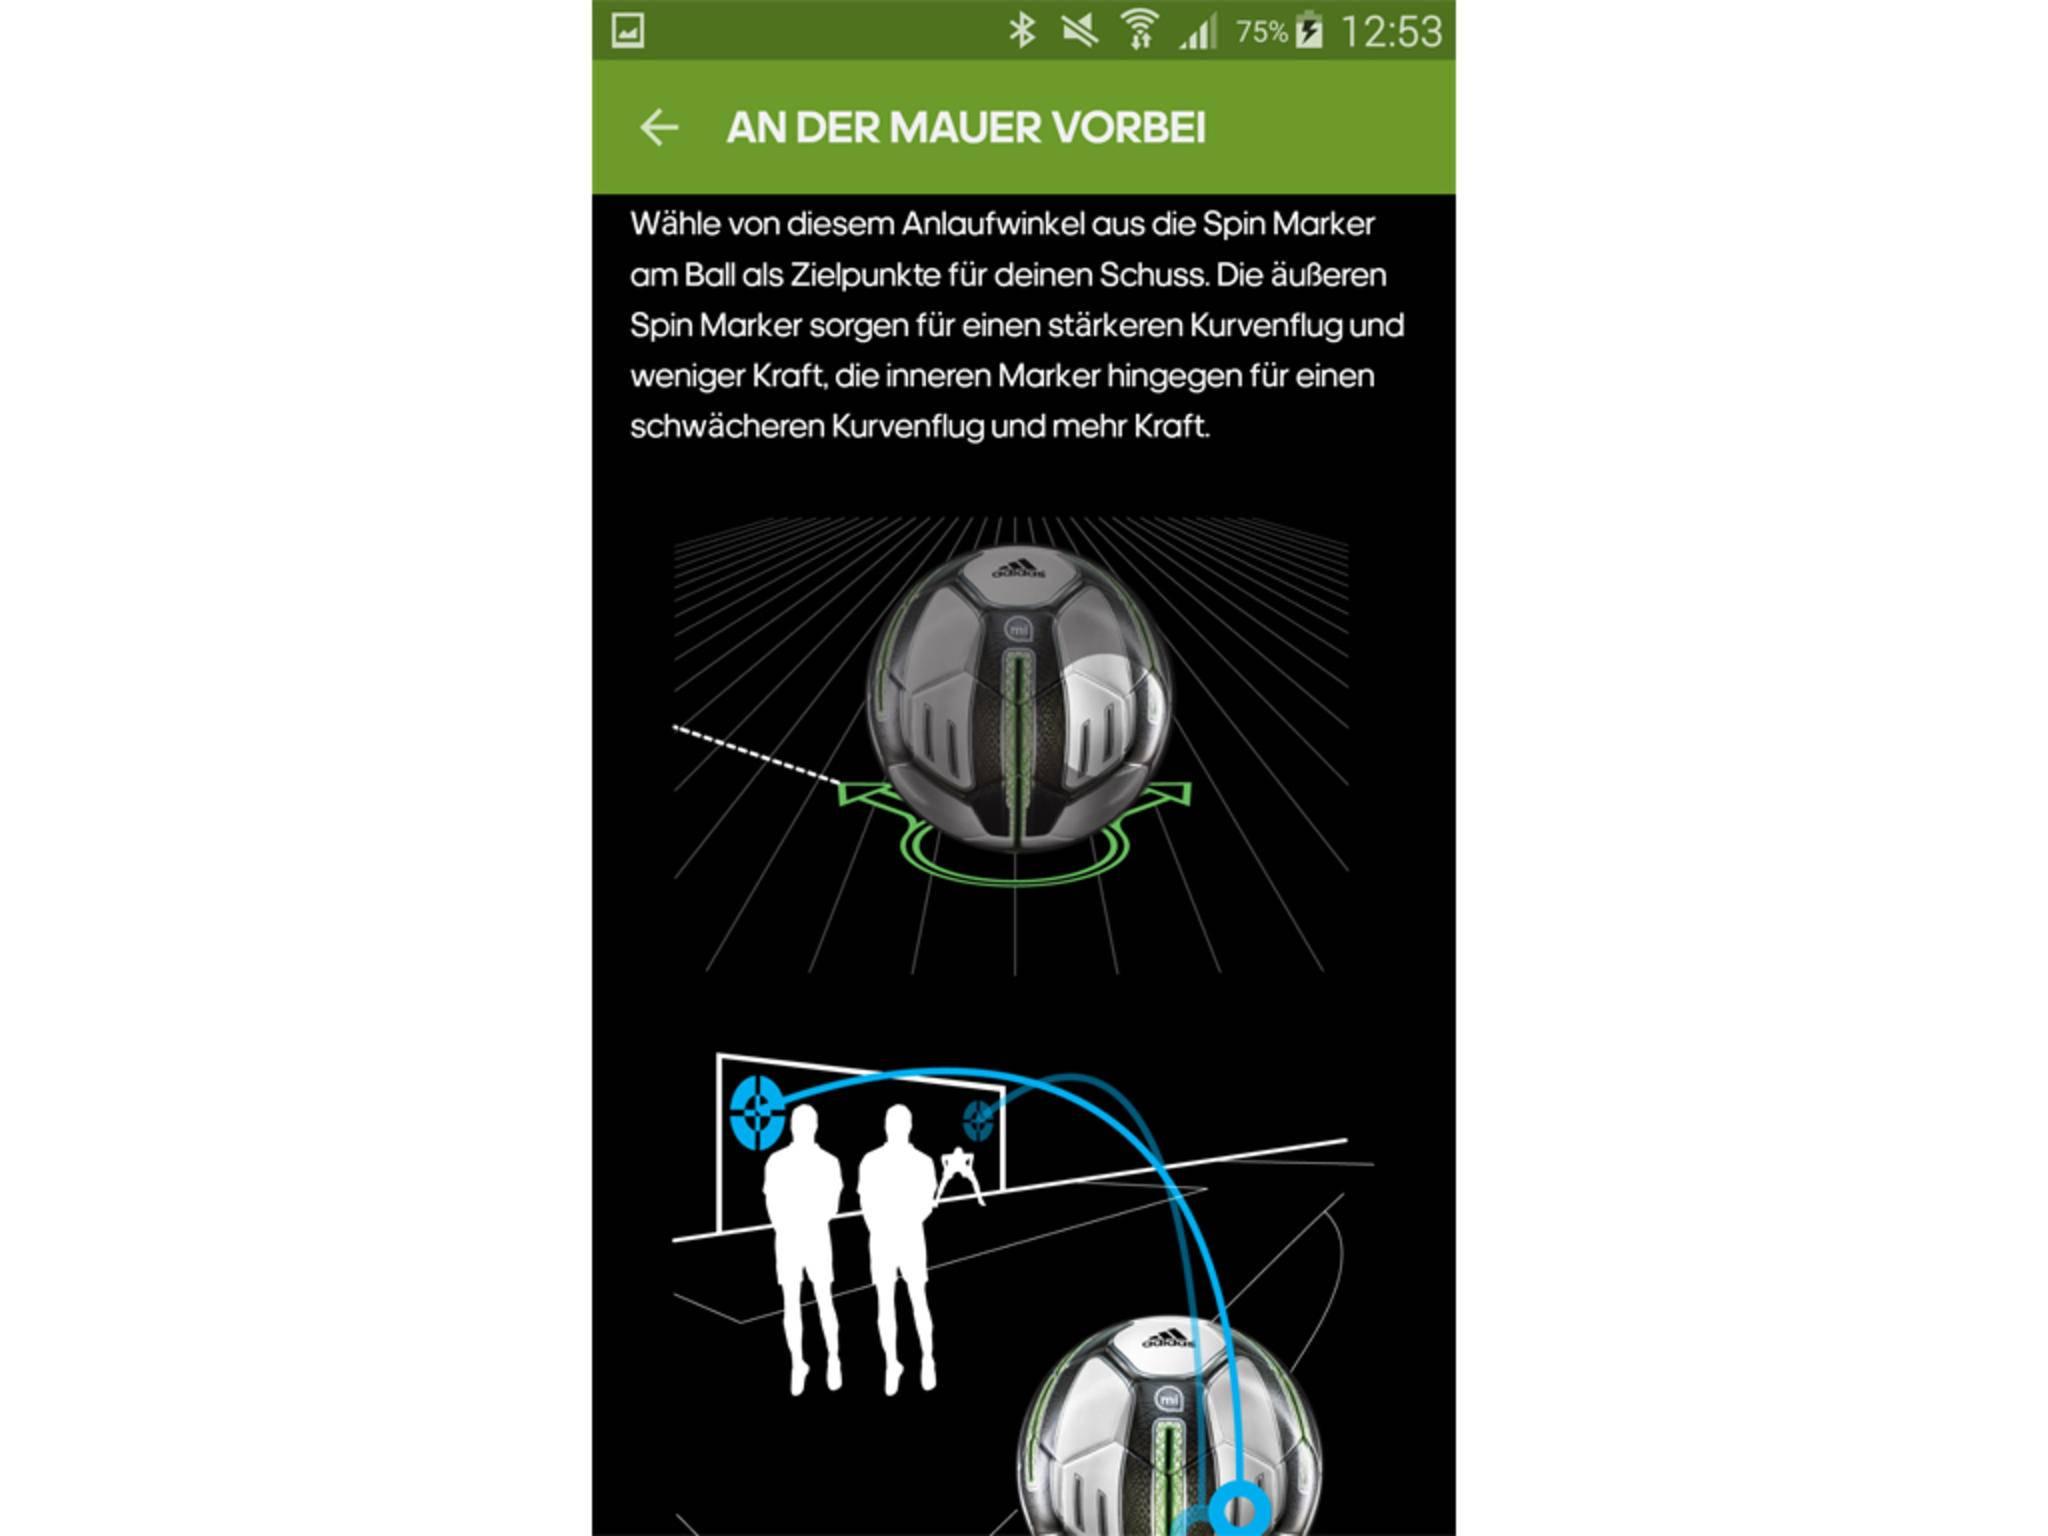 Adidas miCoach Smart Ball App 10